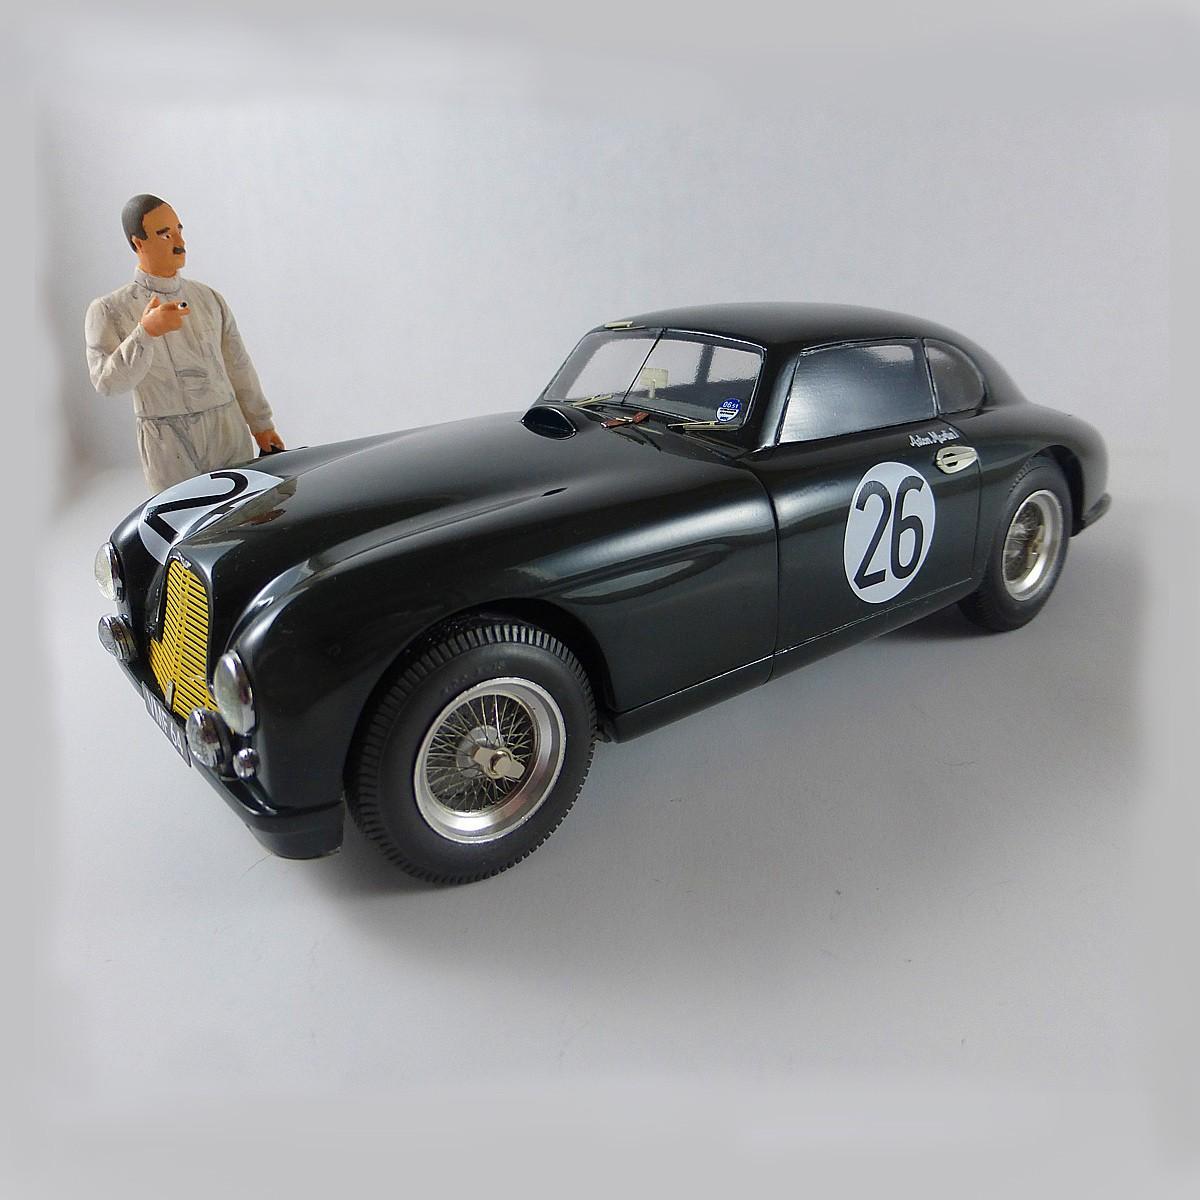 1/24 Kit Aston Martin DB2 N°26 Le Mans 1951, Profil24